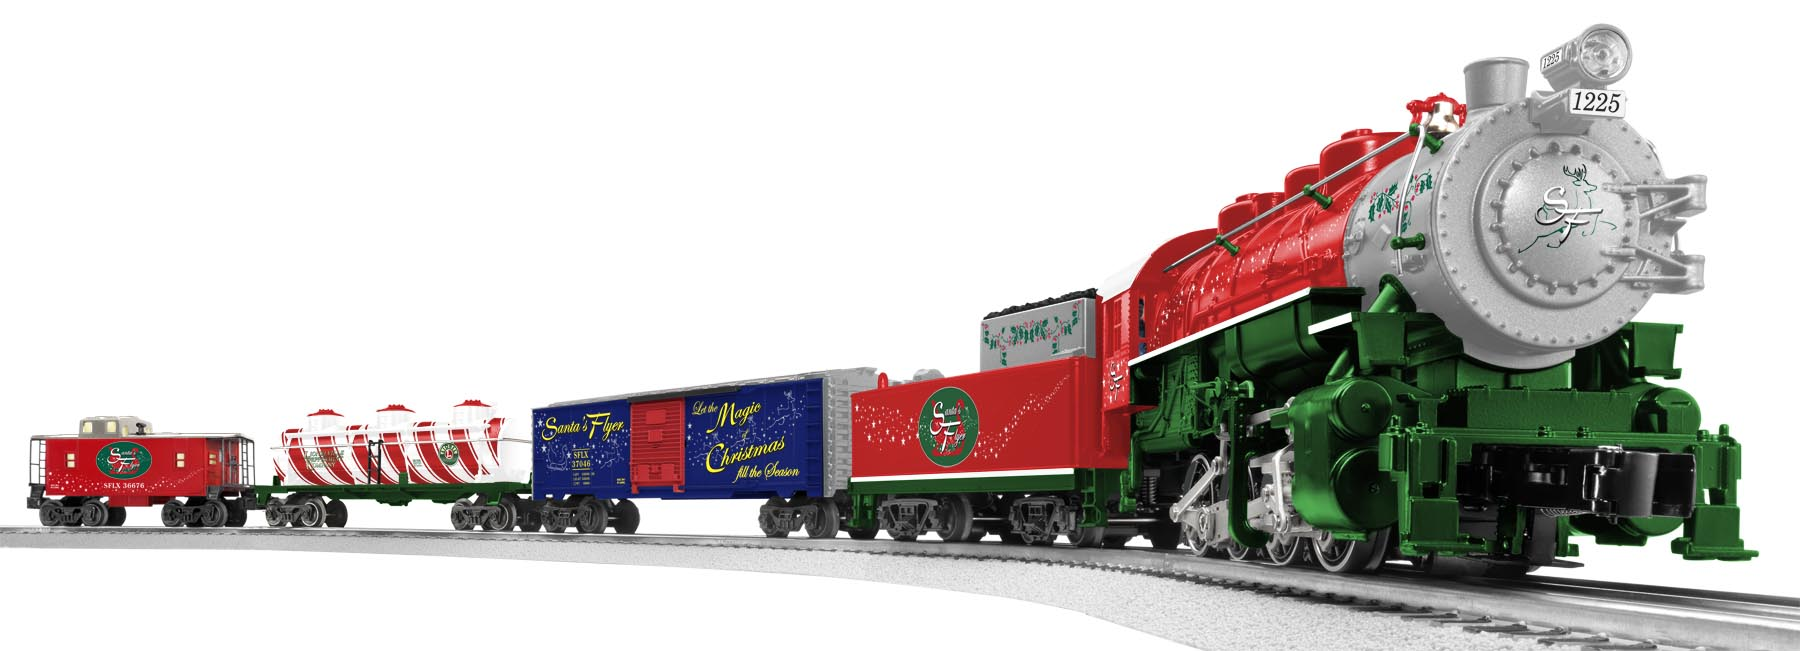 Santa39s Flyer ReadytoRun Train Set 080 Steam Loco 1225